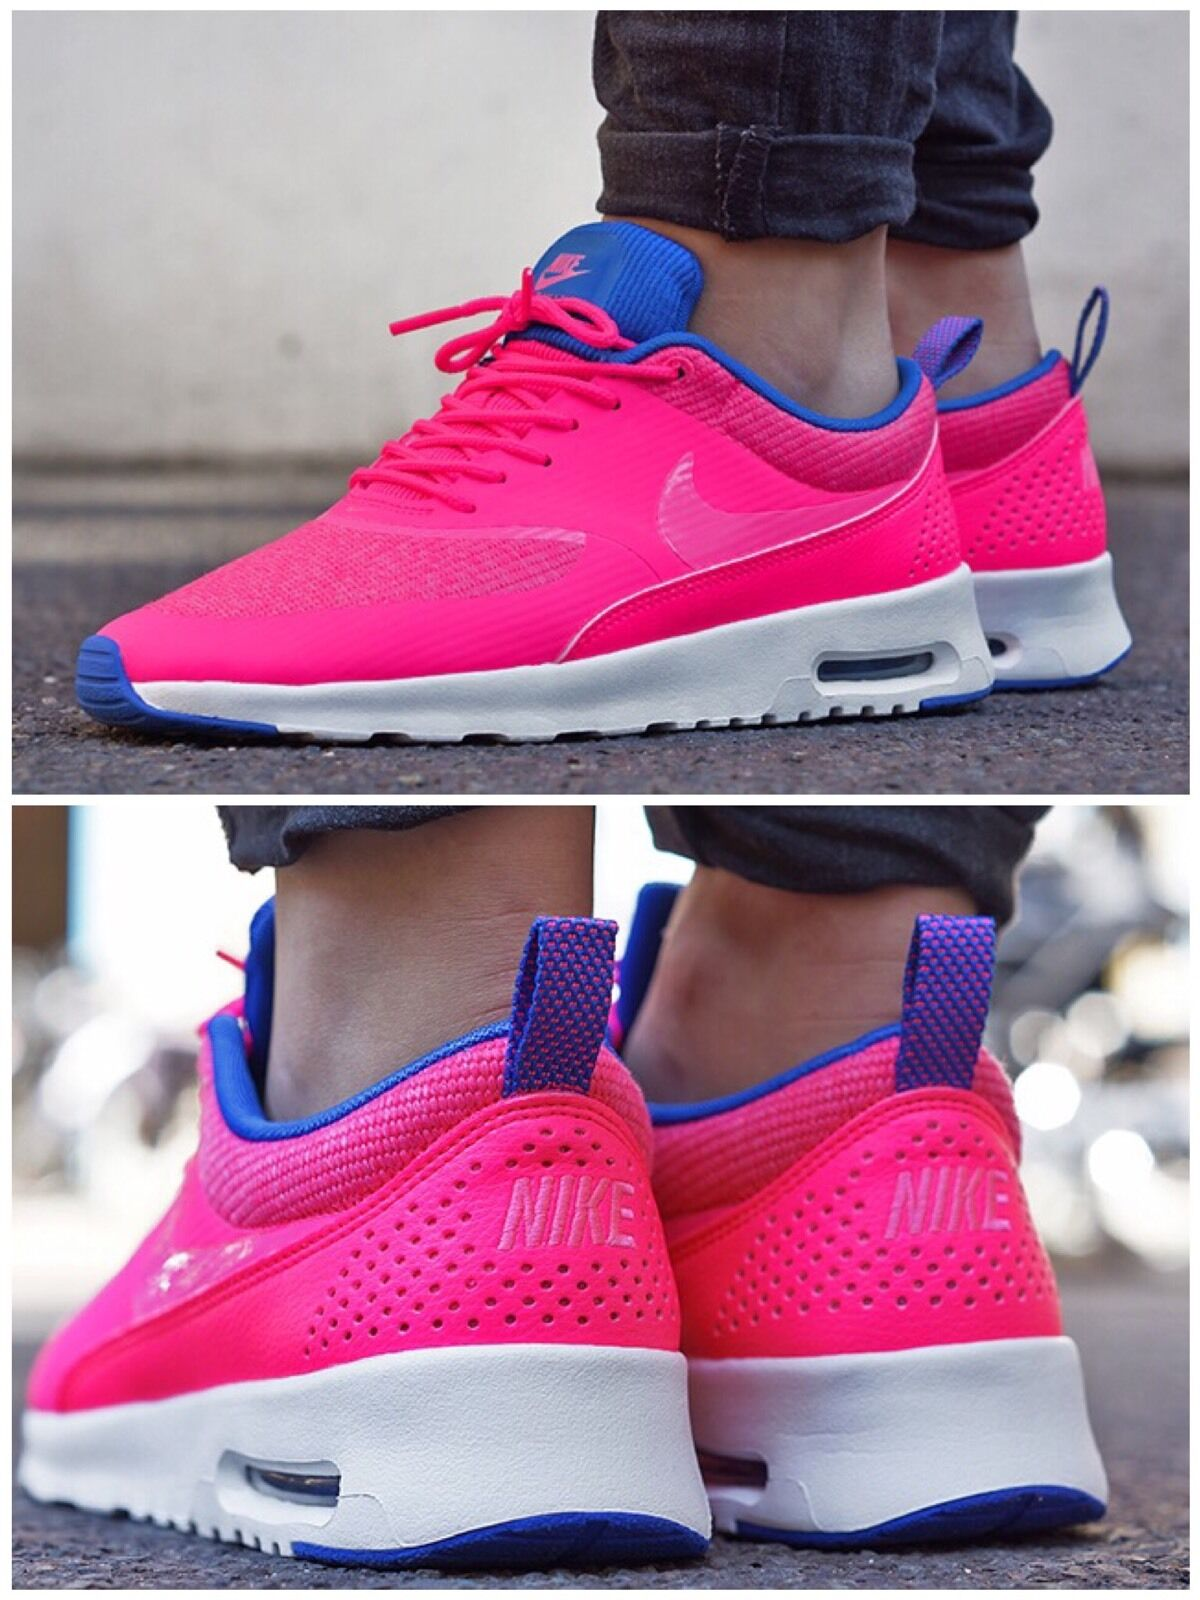 Nike Air Max Thea Premium. Premium. Premium.  616723 601. U.K. Size 4 d8a0eb